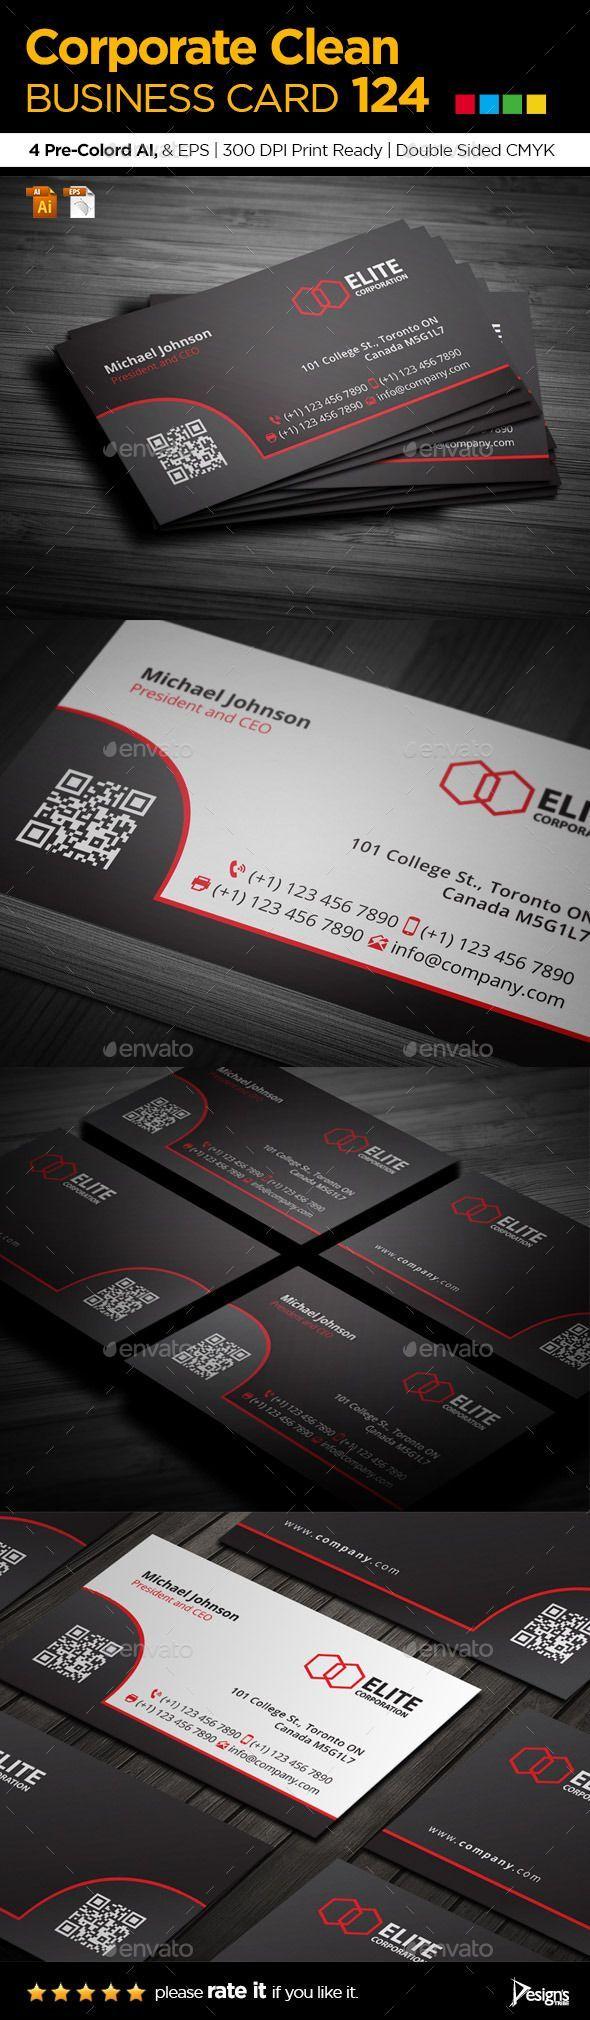 25 parasta ideaa pinterestiss qr code business card simple and clean business card 124 magicingreecefo Gallery